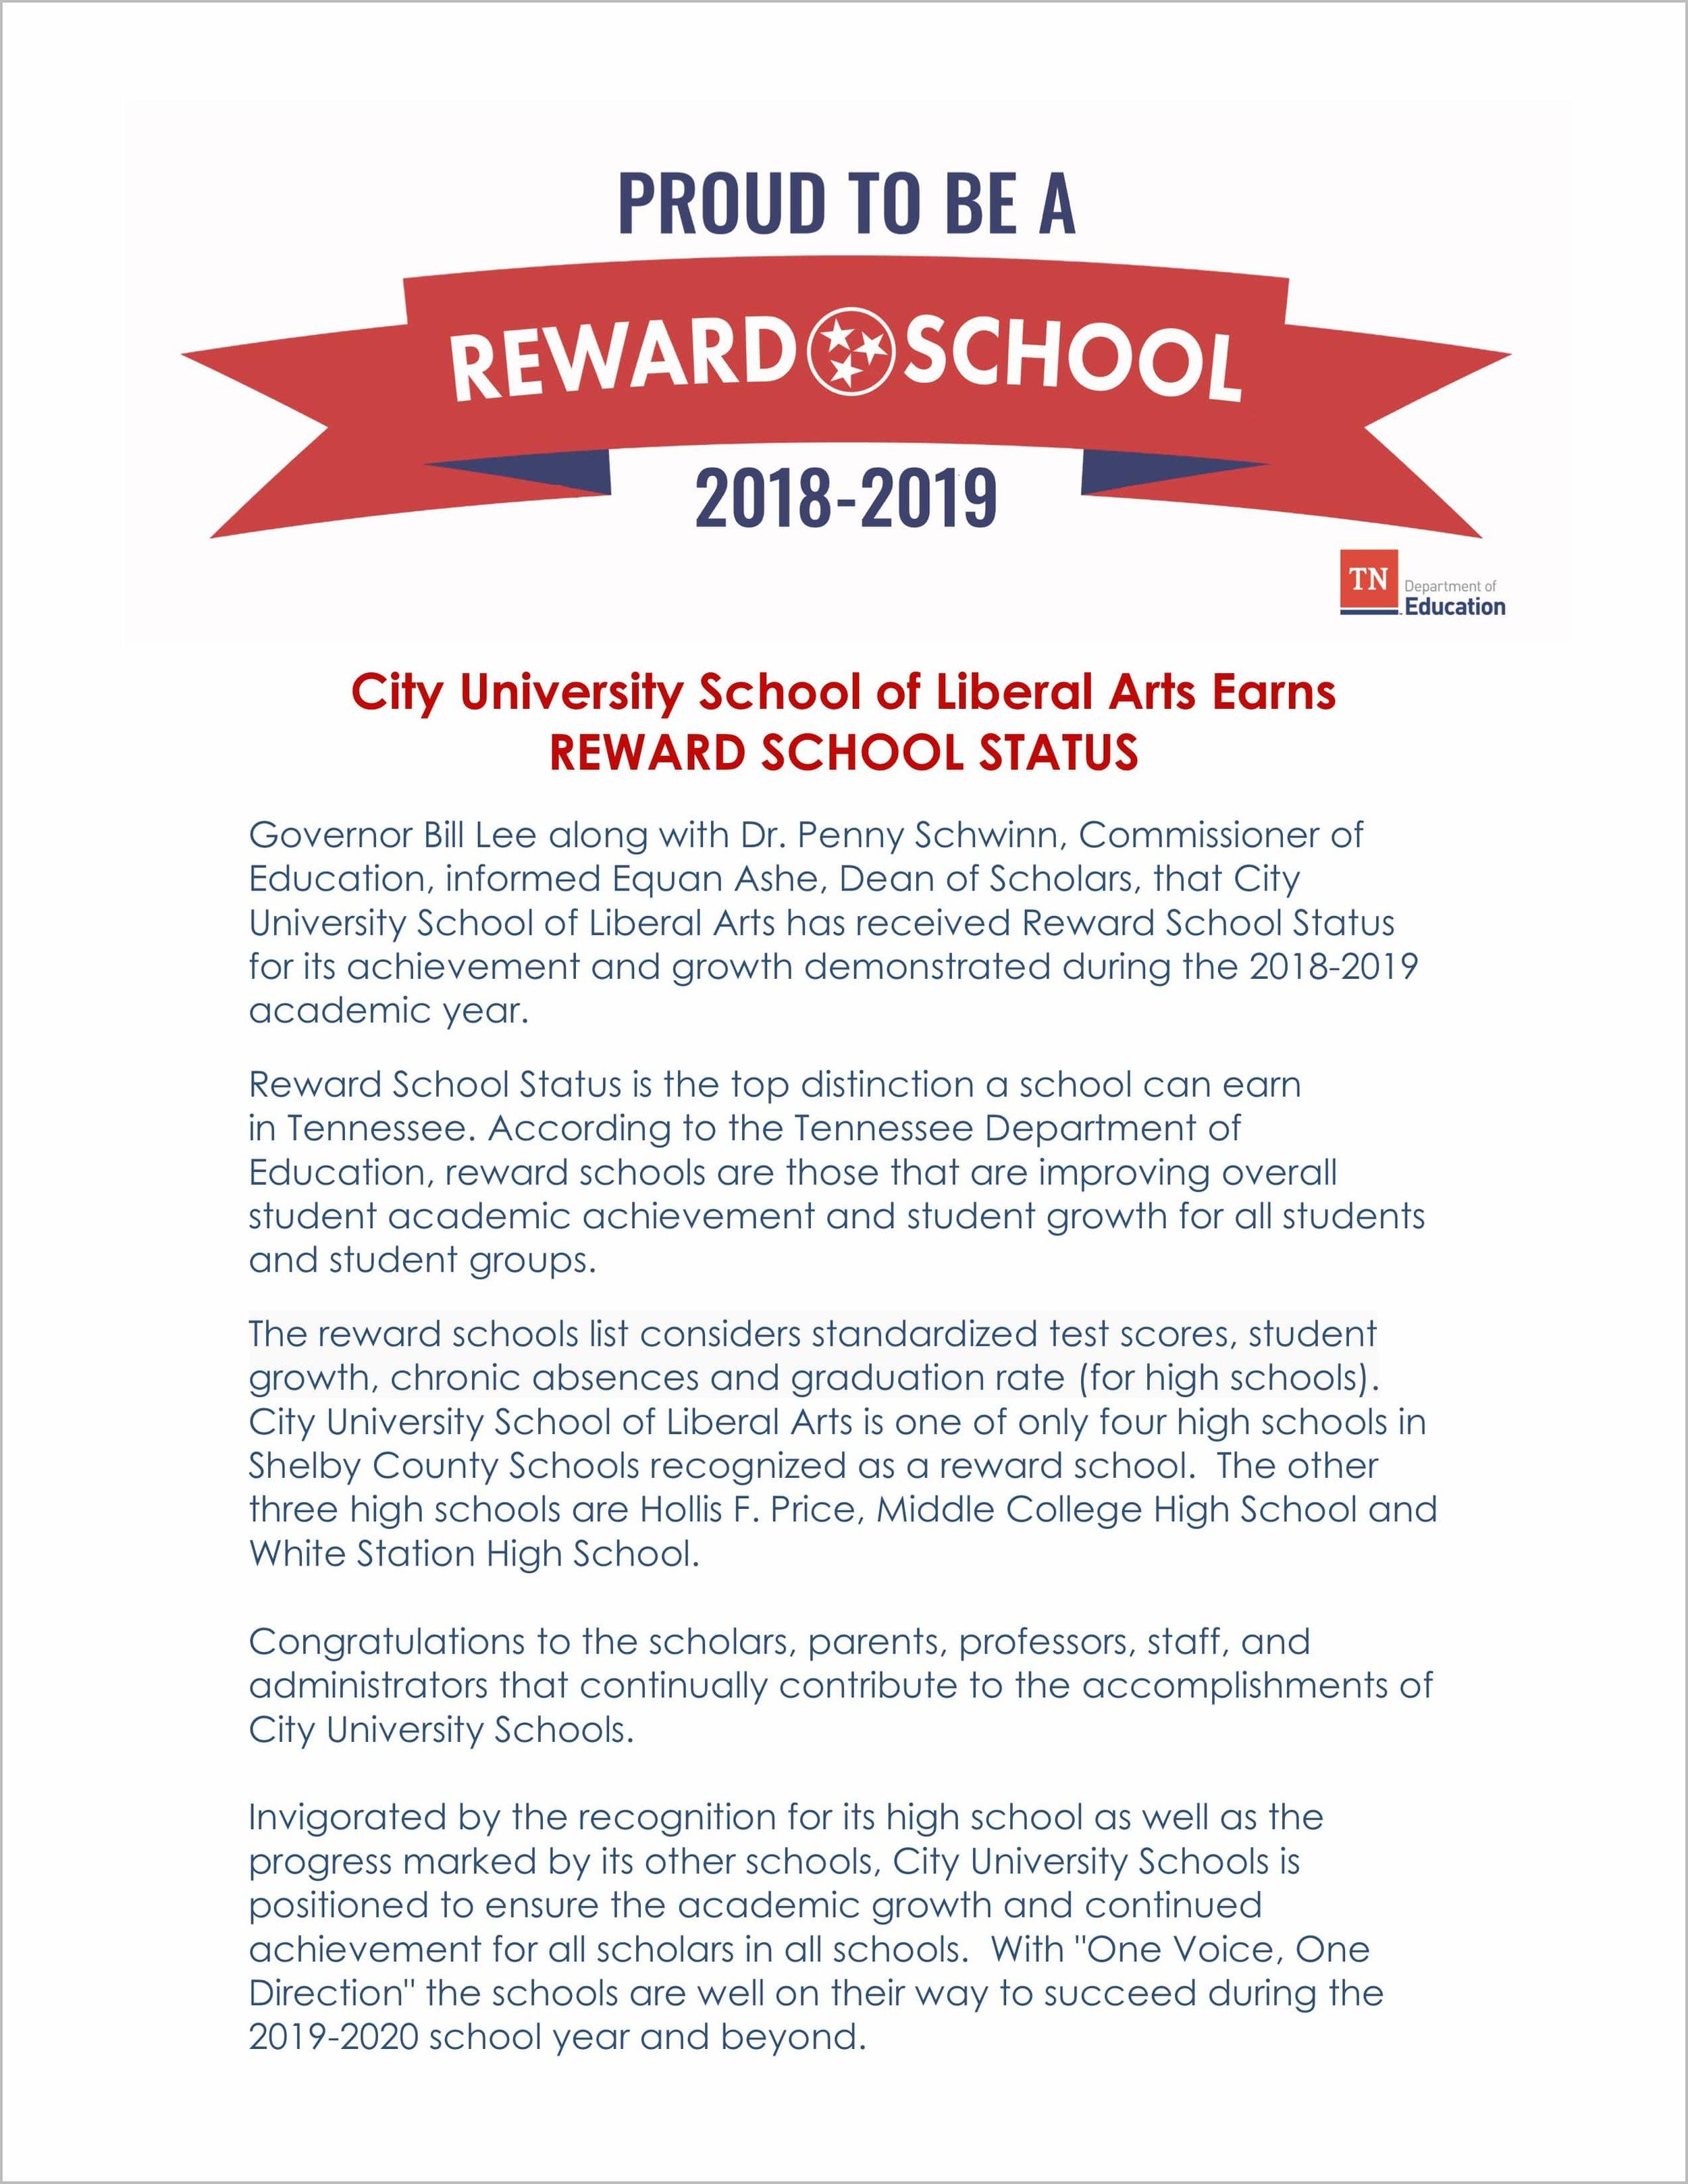 City University School of Liberal Arts Earns Reward School Status